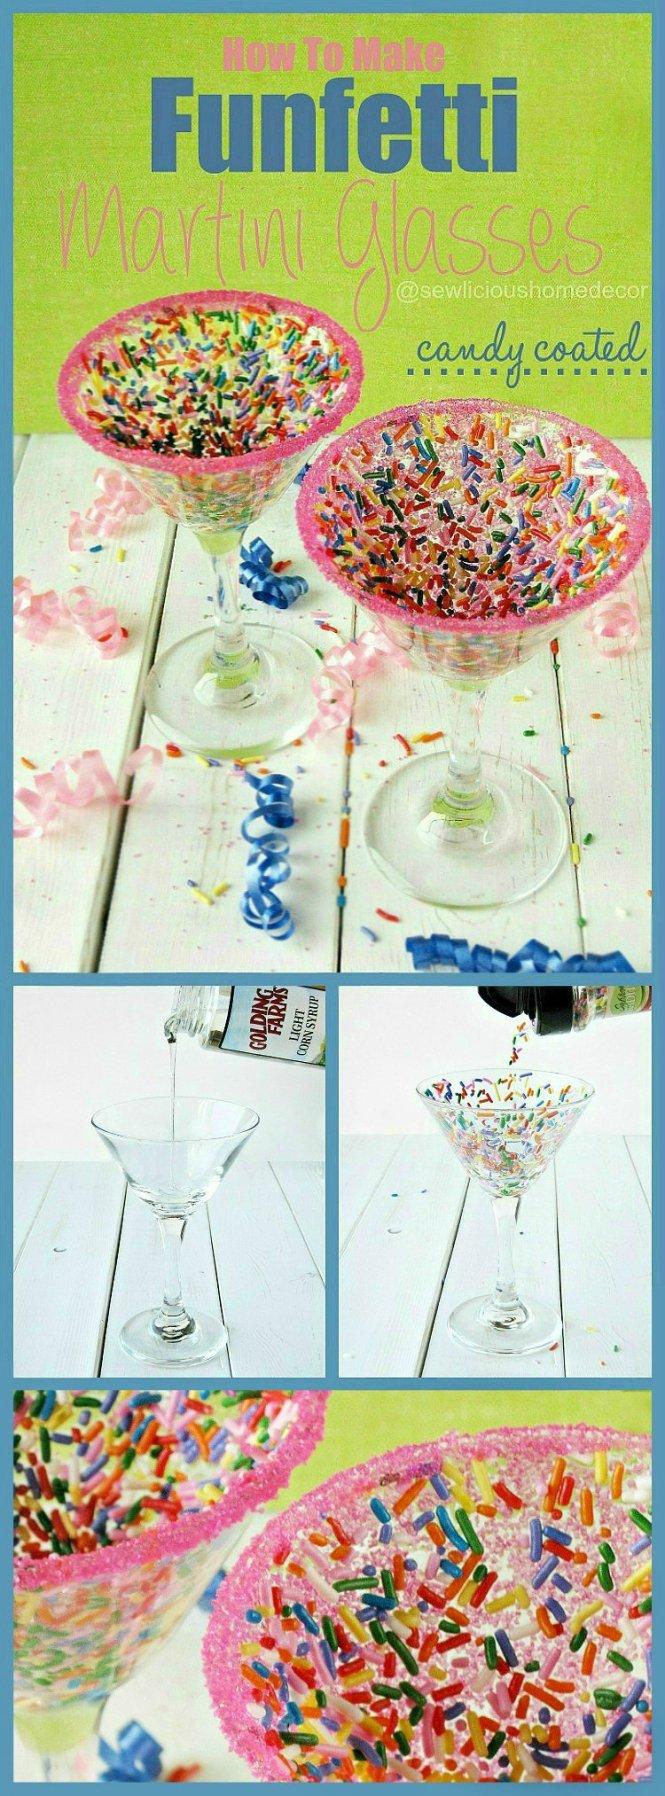 How To Make Funfetti Martini Glasses Candy Coated sewlicioushomedecor.com